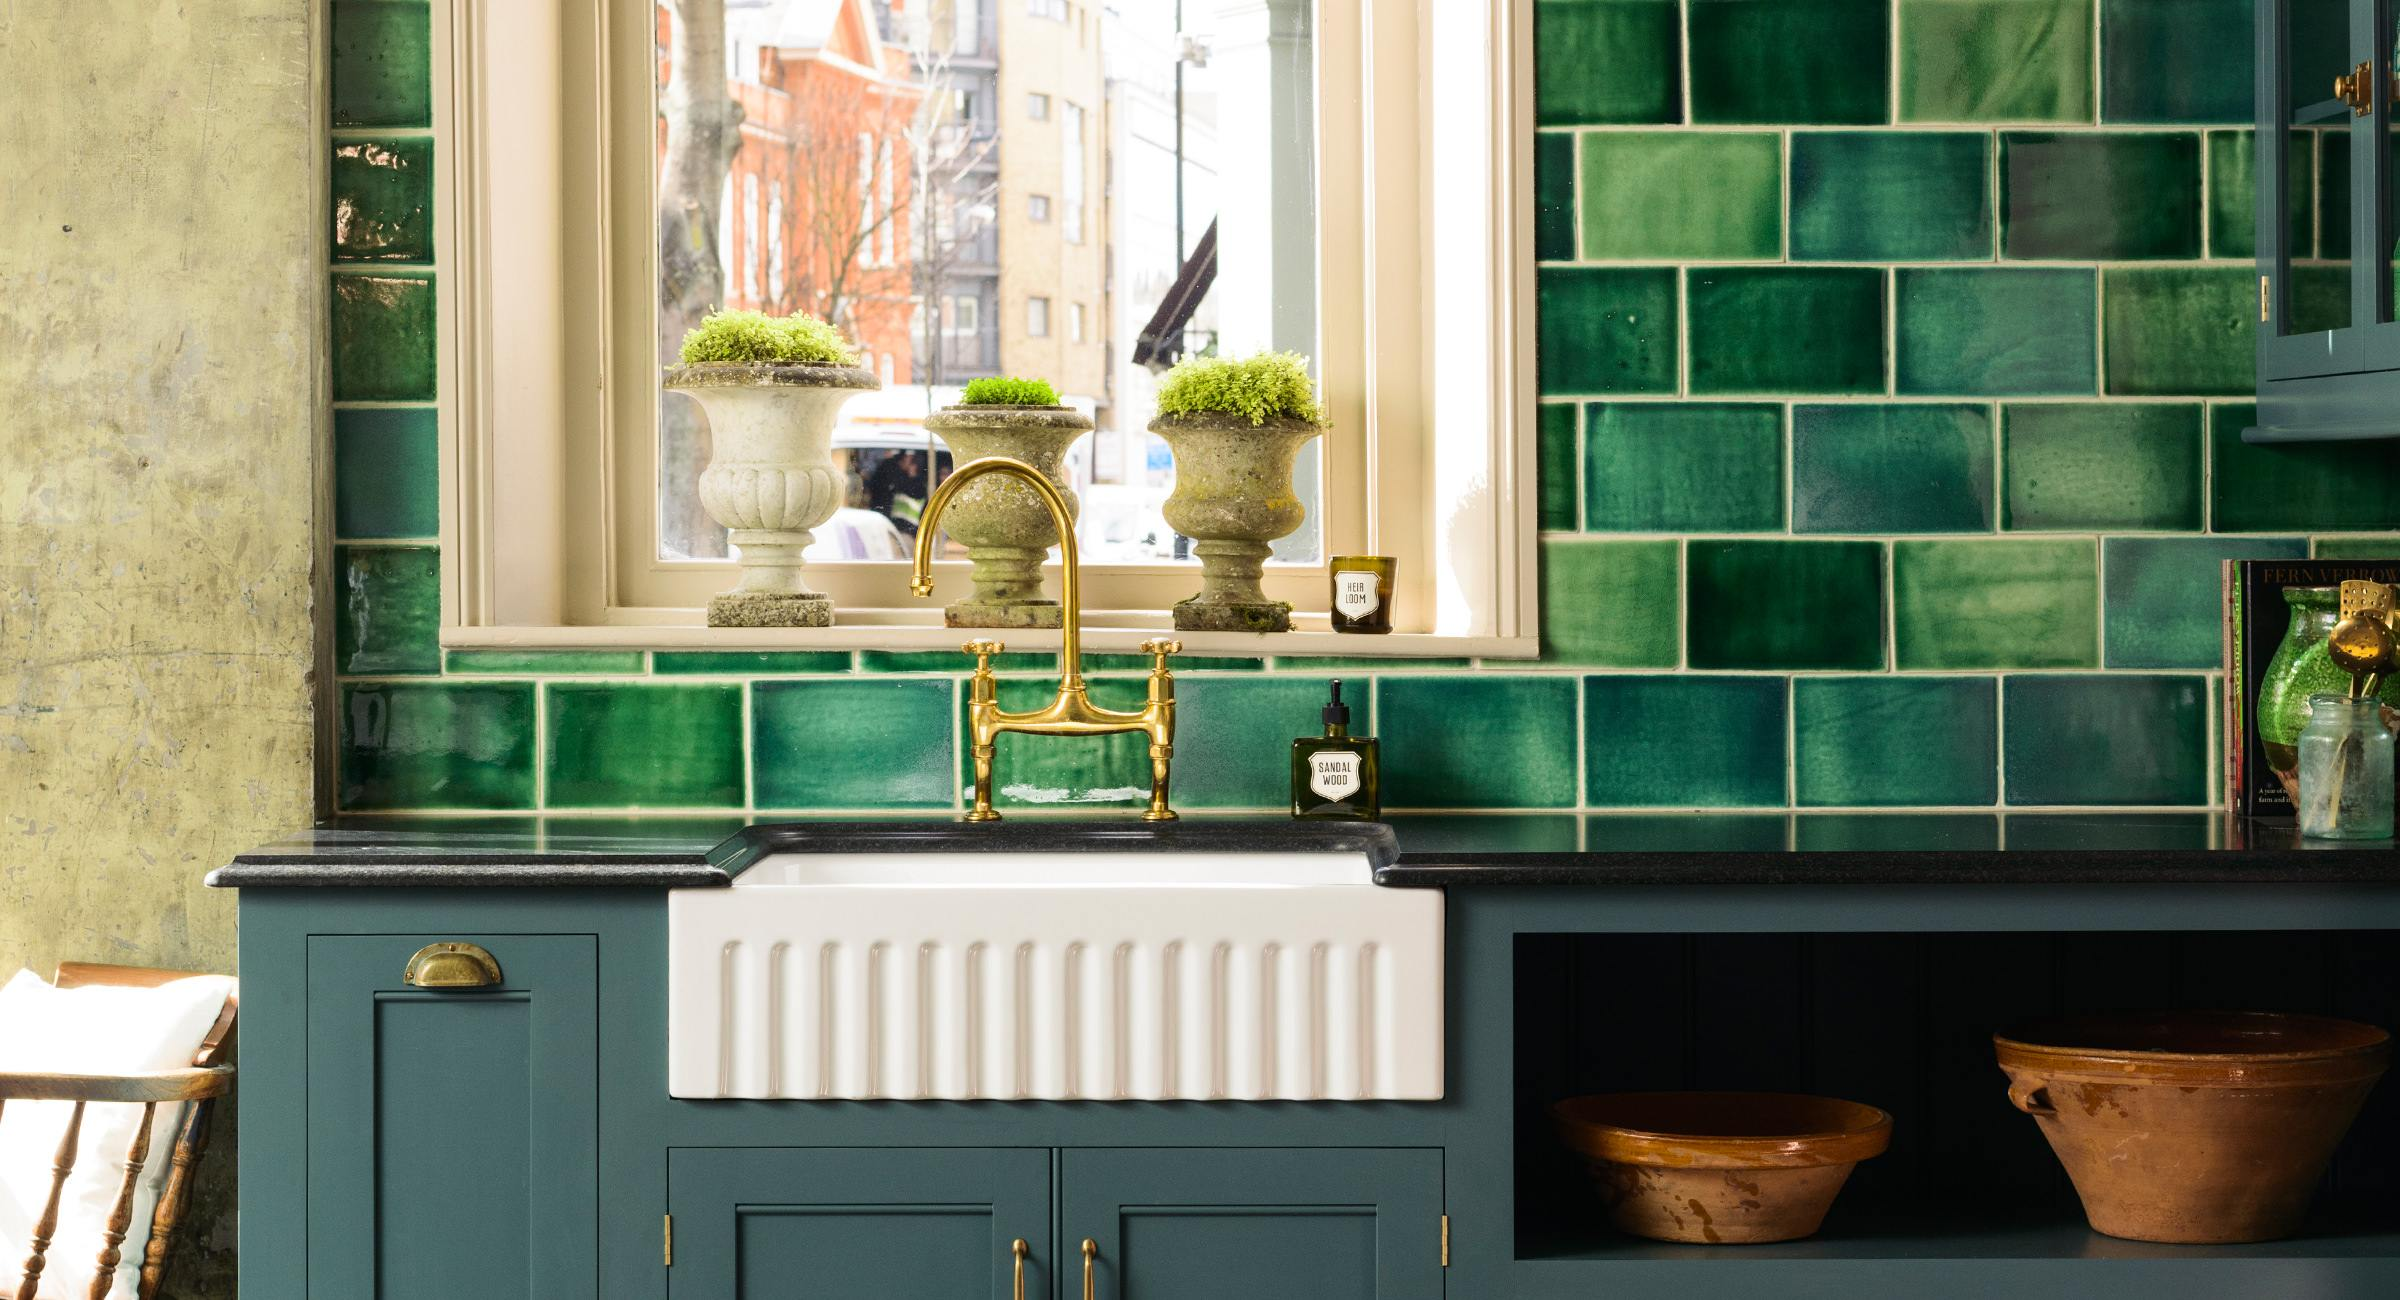 DeVOL Emerald Green London Tiles Photo 1 ...